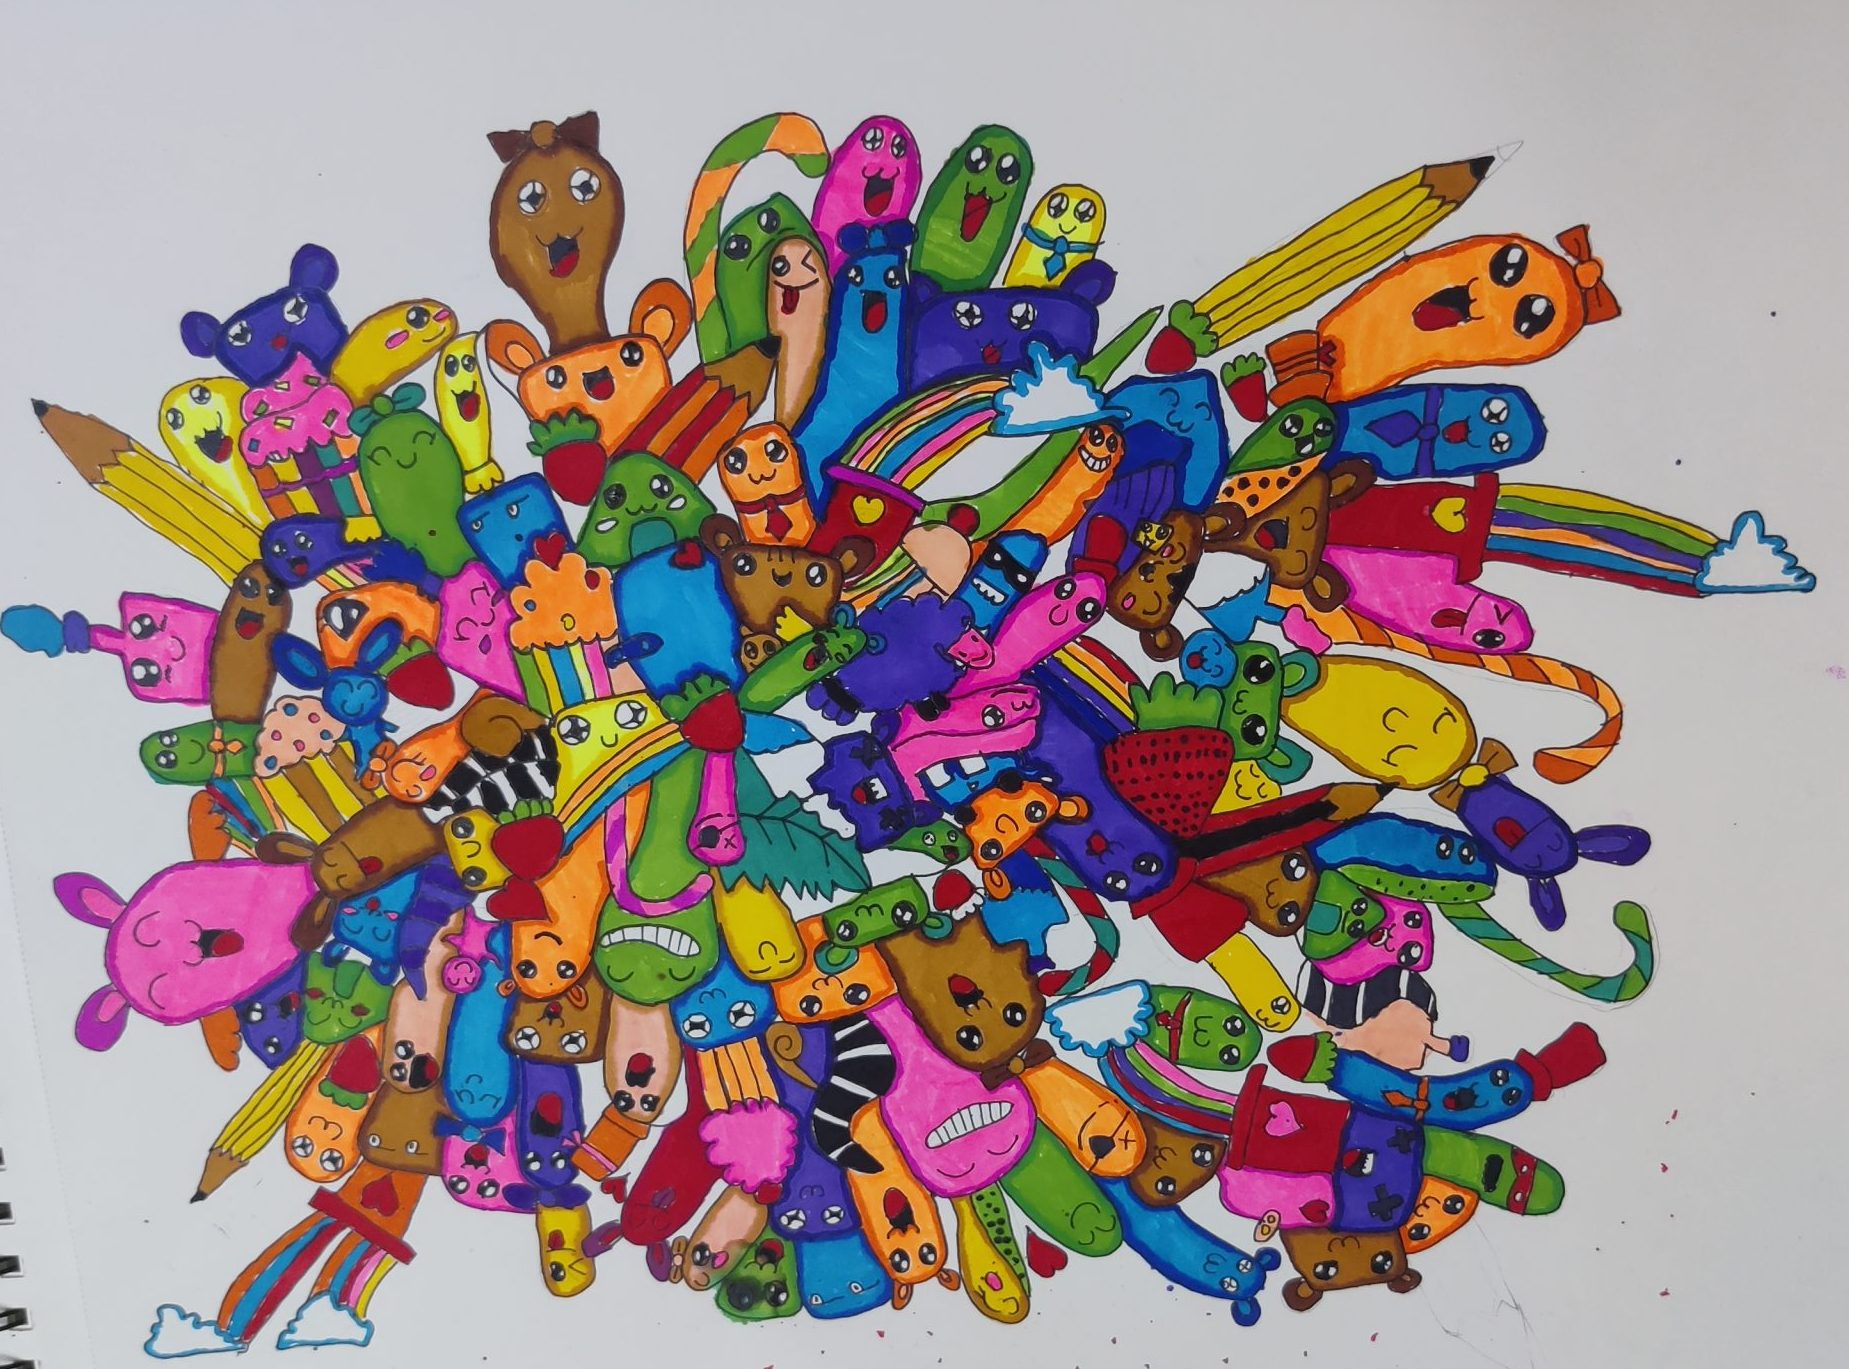 Image depicting Doodle